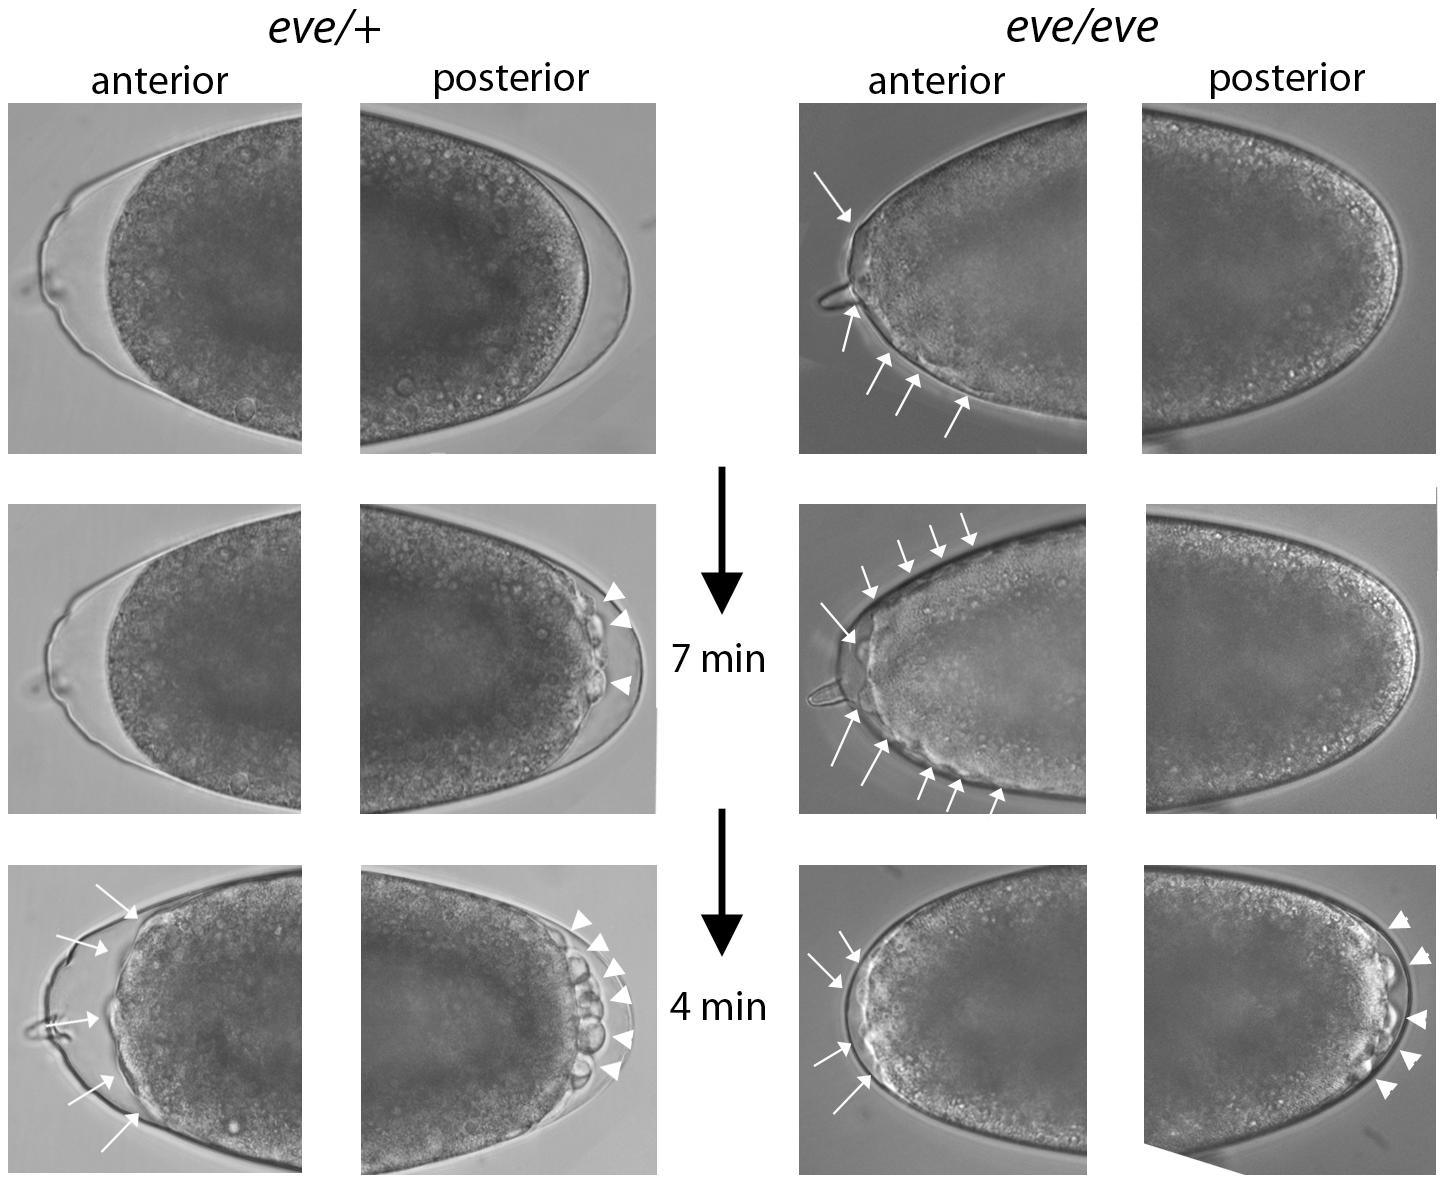 Phenotype of <i>even-skipped</i> pre-blastoderm embryos.